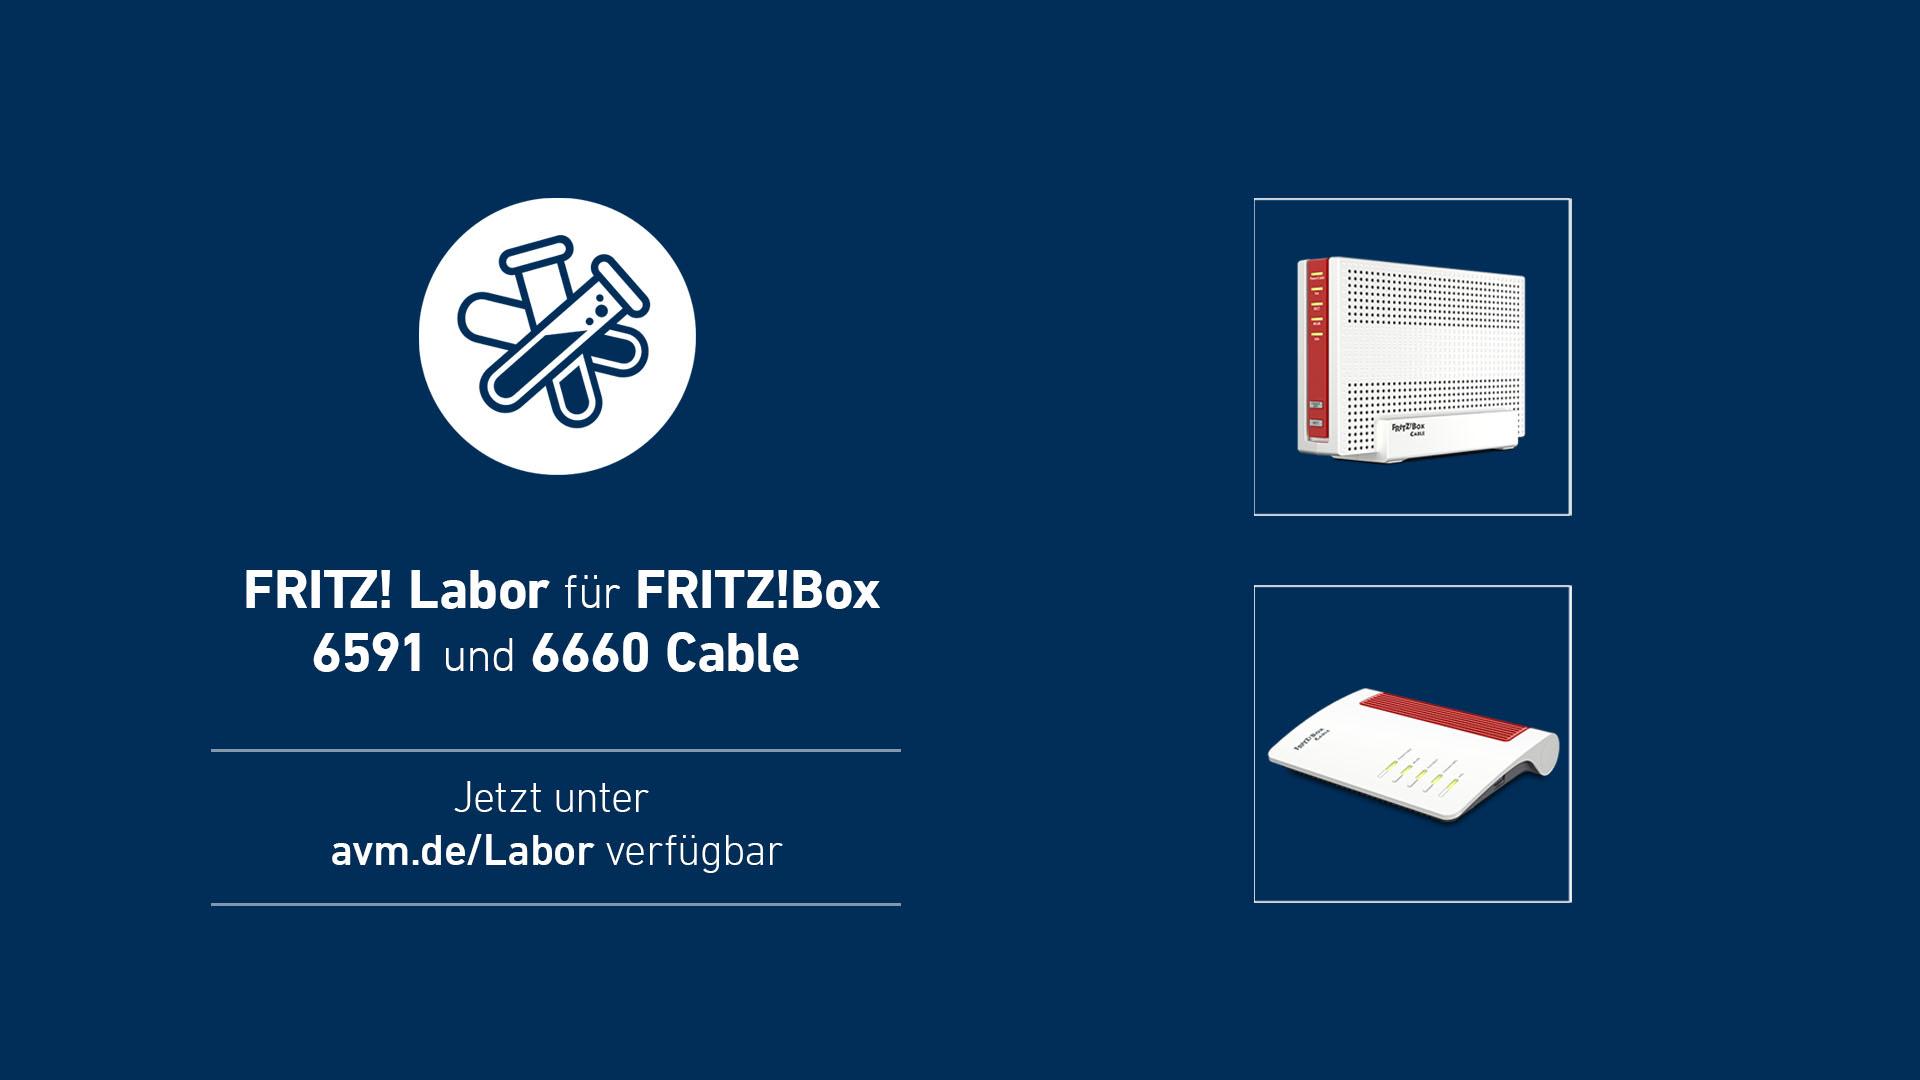 FritzBox Beta behebt Mac Problem bei Kabelroutern   COMPUTER BILD